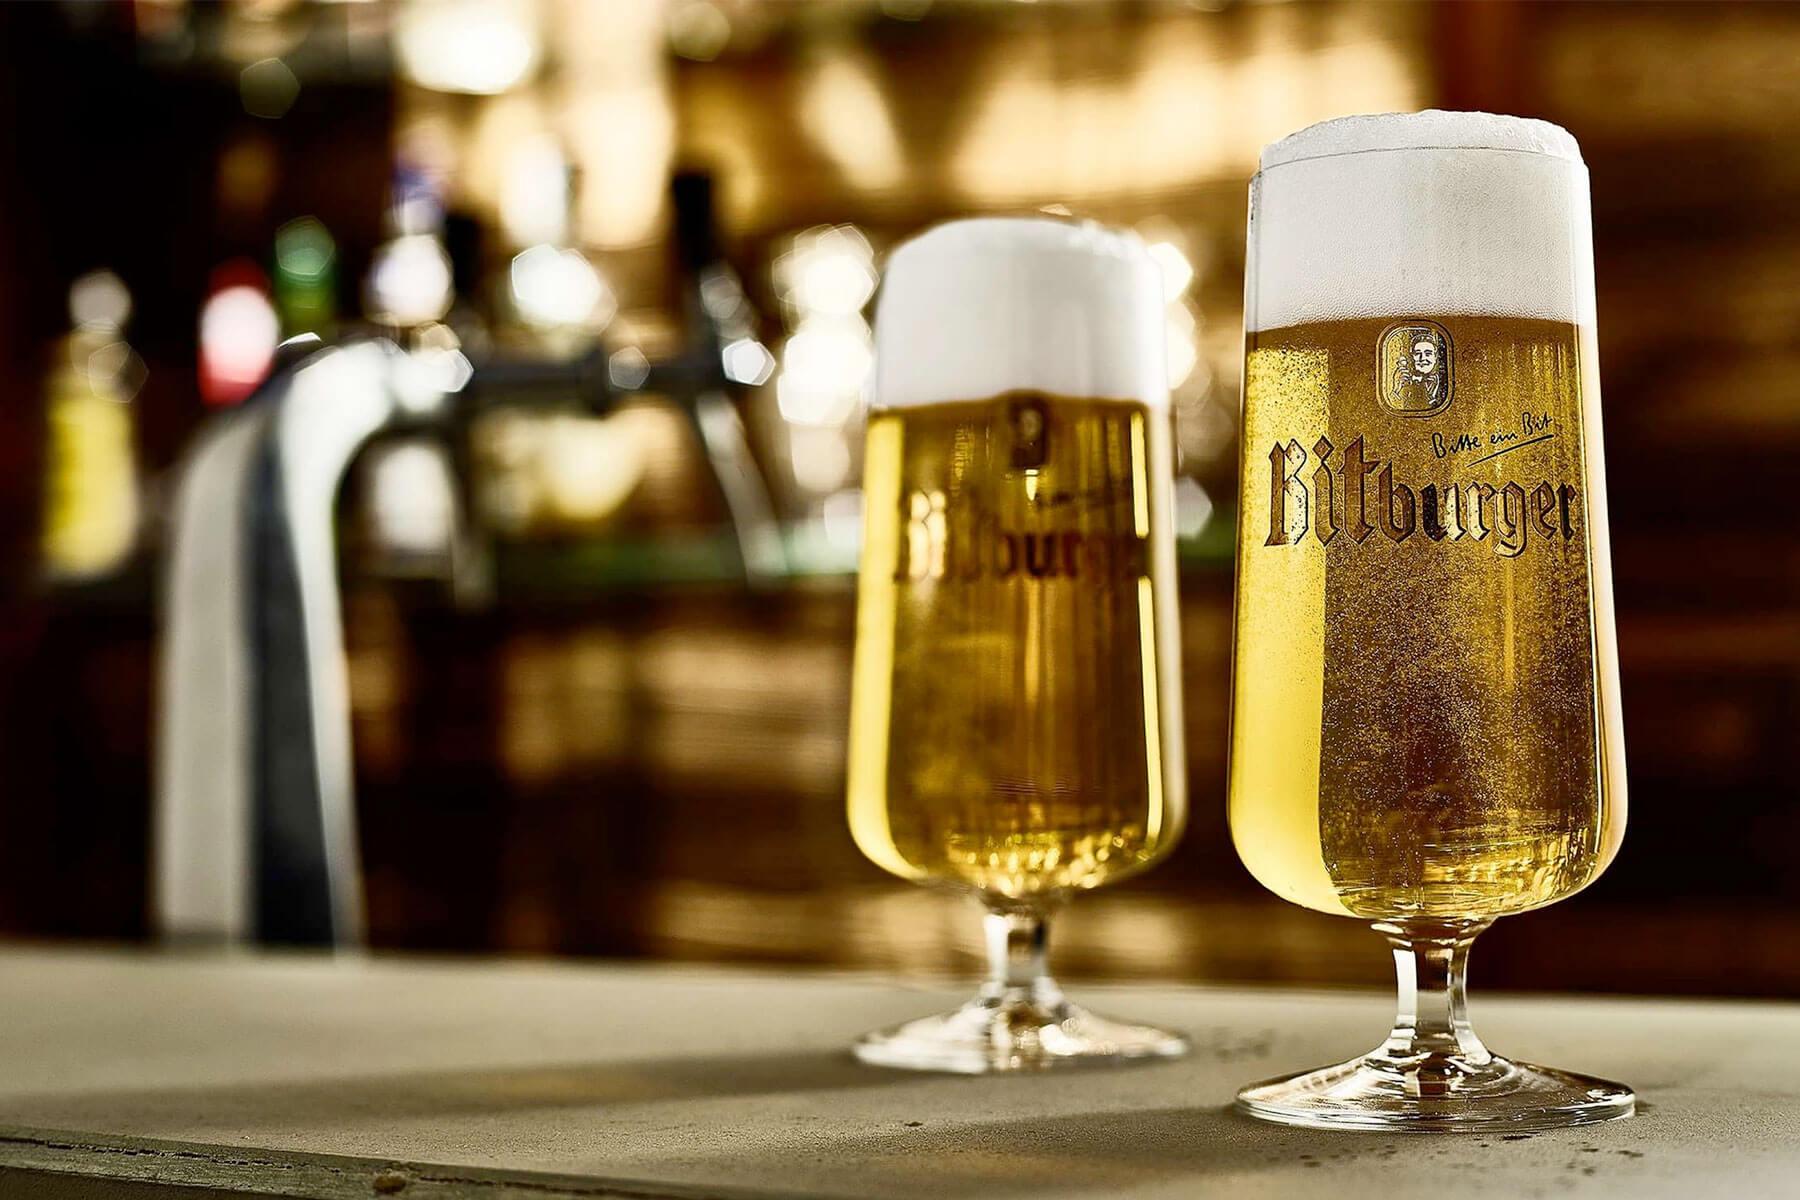 A pair of beers in Bitburger branded pilsner glasses